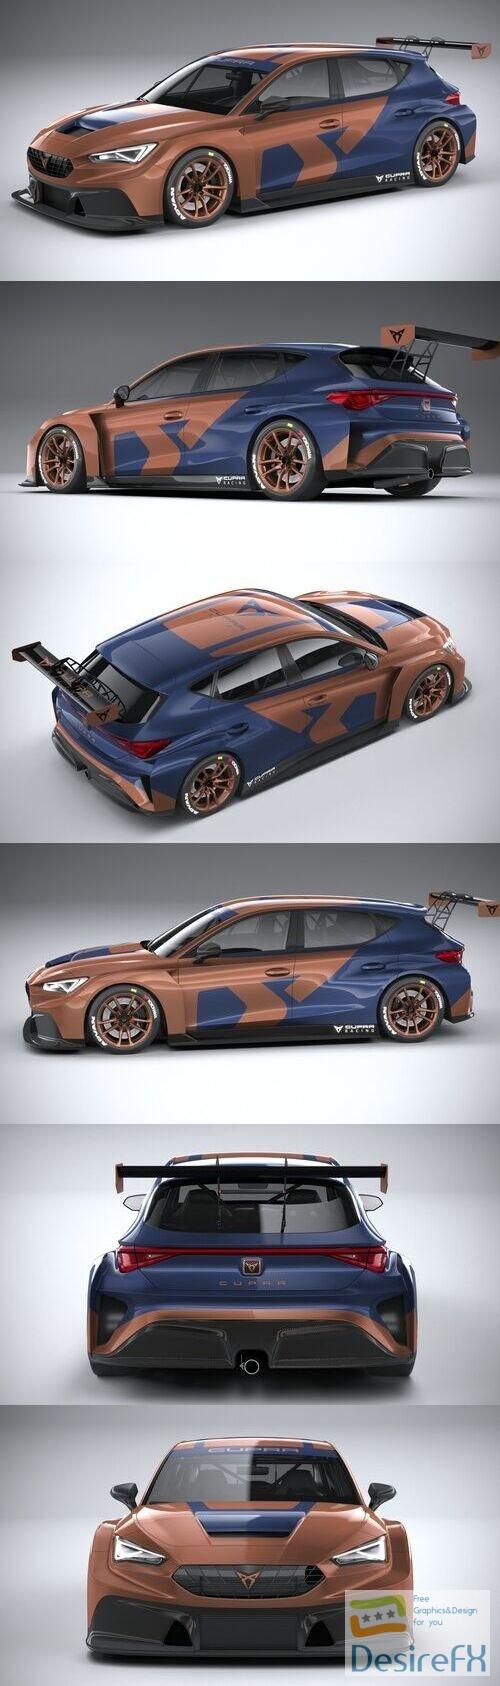 Seat Leon Cupra Competicion 2020 3D Model